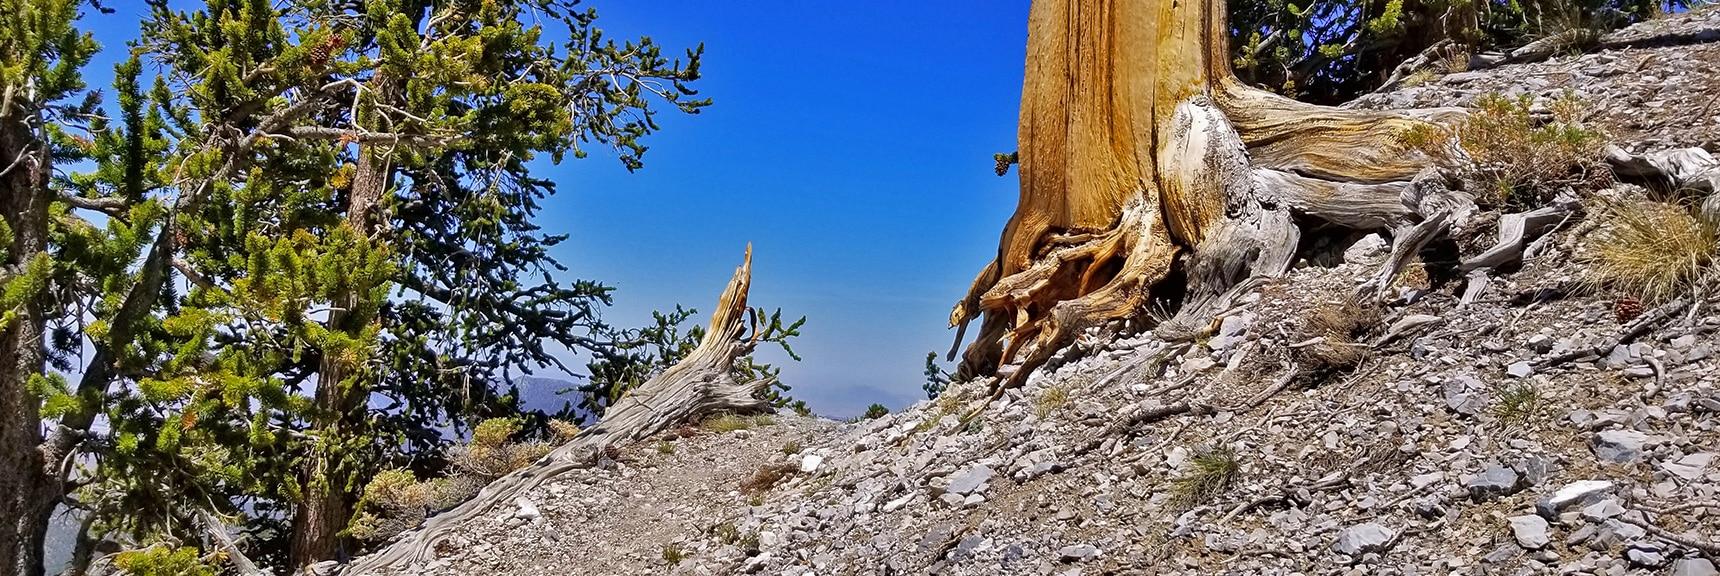 More Amazing Bristlecone Pine Sculptures on Bonanza Trail Near McFarland Peak | Base of McFarland Peak via Bristlecone Pine Trail and Bonanza Trail | Lee Canyon | Spring Mountains, Nevada